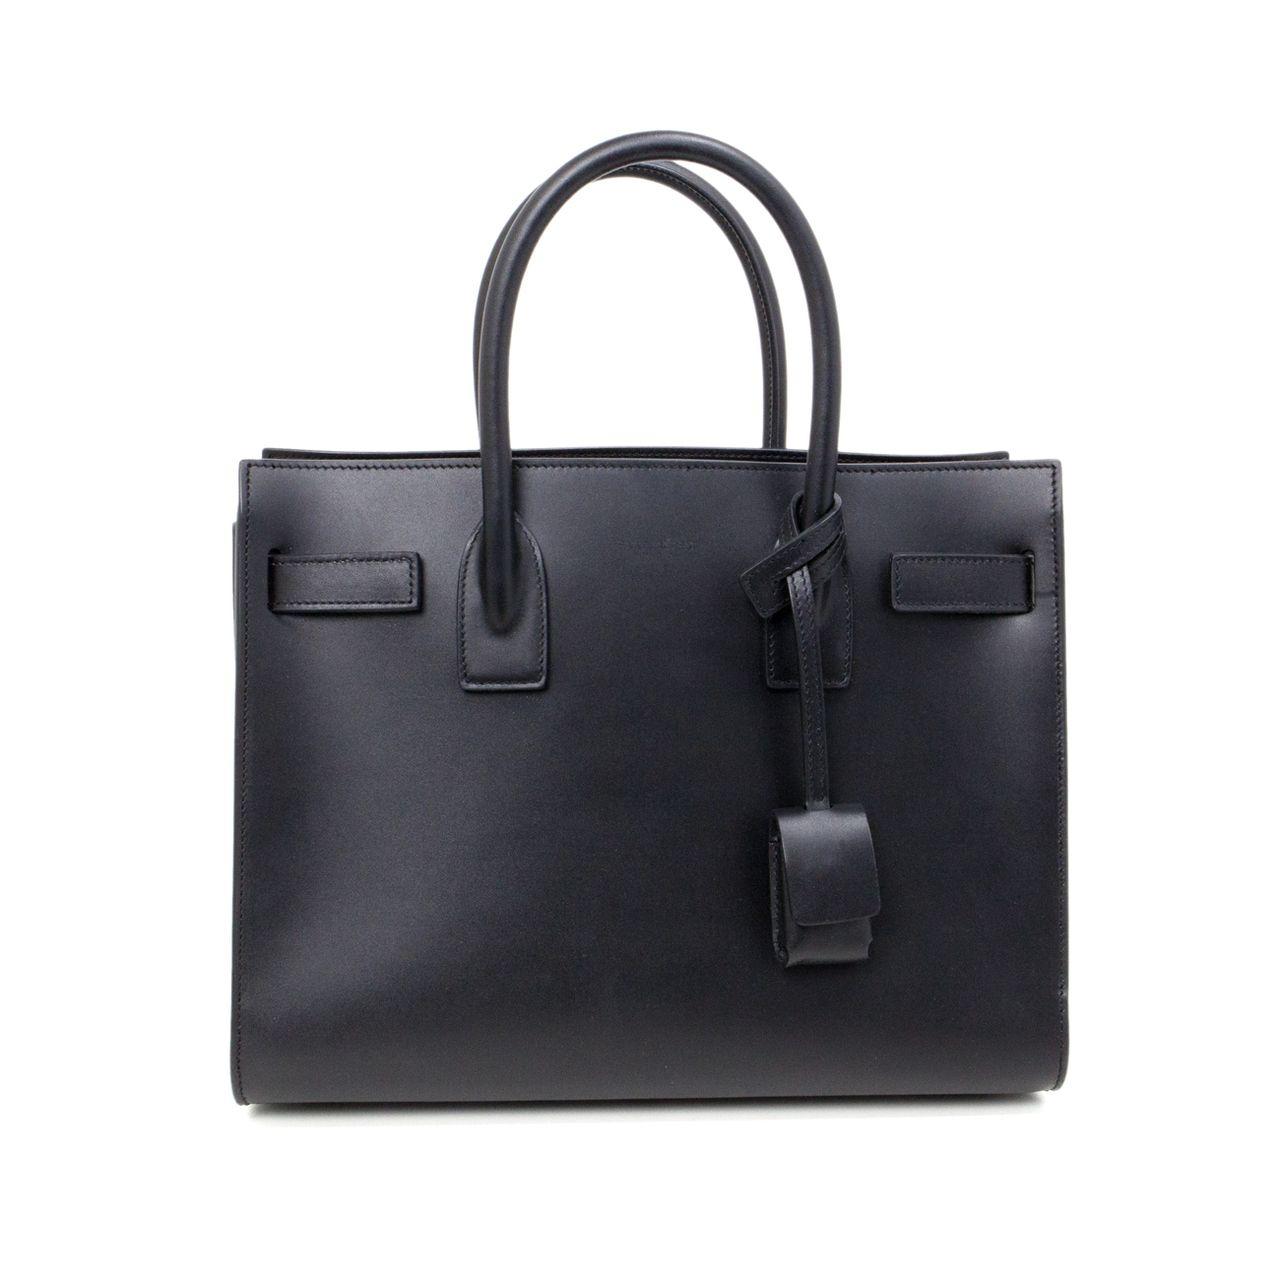 41093619cb5c7 YSL Saint Laurent Black Smooth Leather Baby Sac De Jour - modaselle ...